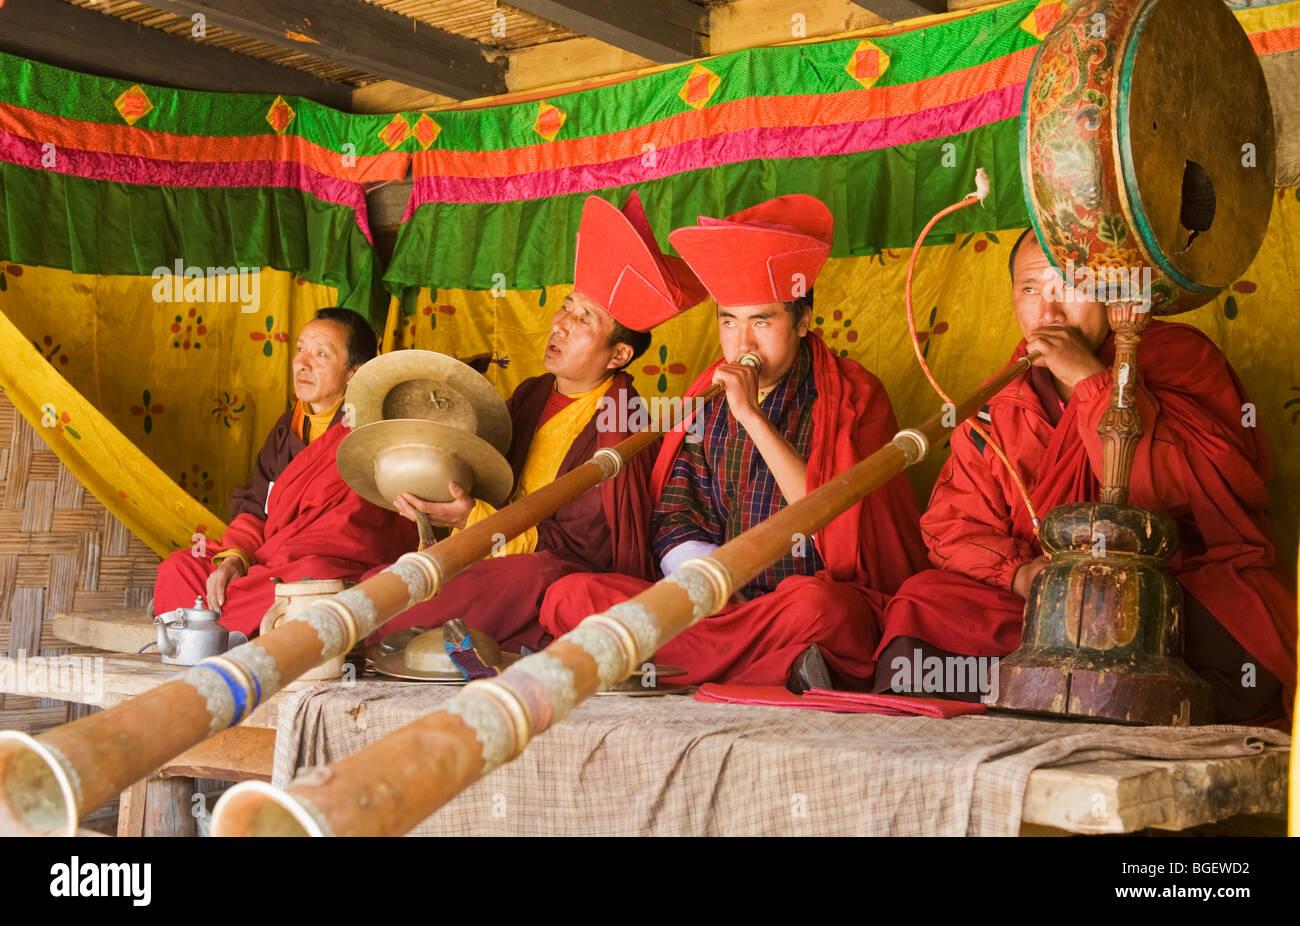 Monk Musicians play at Tsechu, or Festival, Ura, Bumthang Valley, BHUTAN - Stock Image